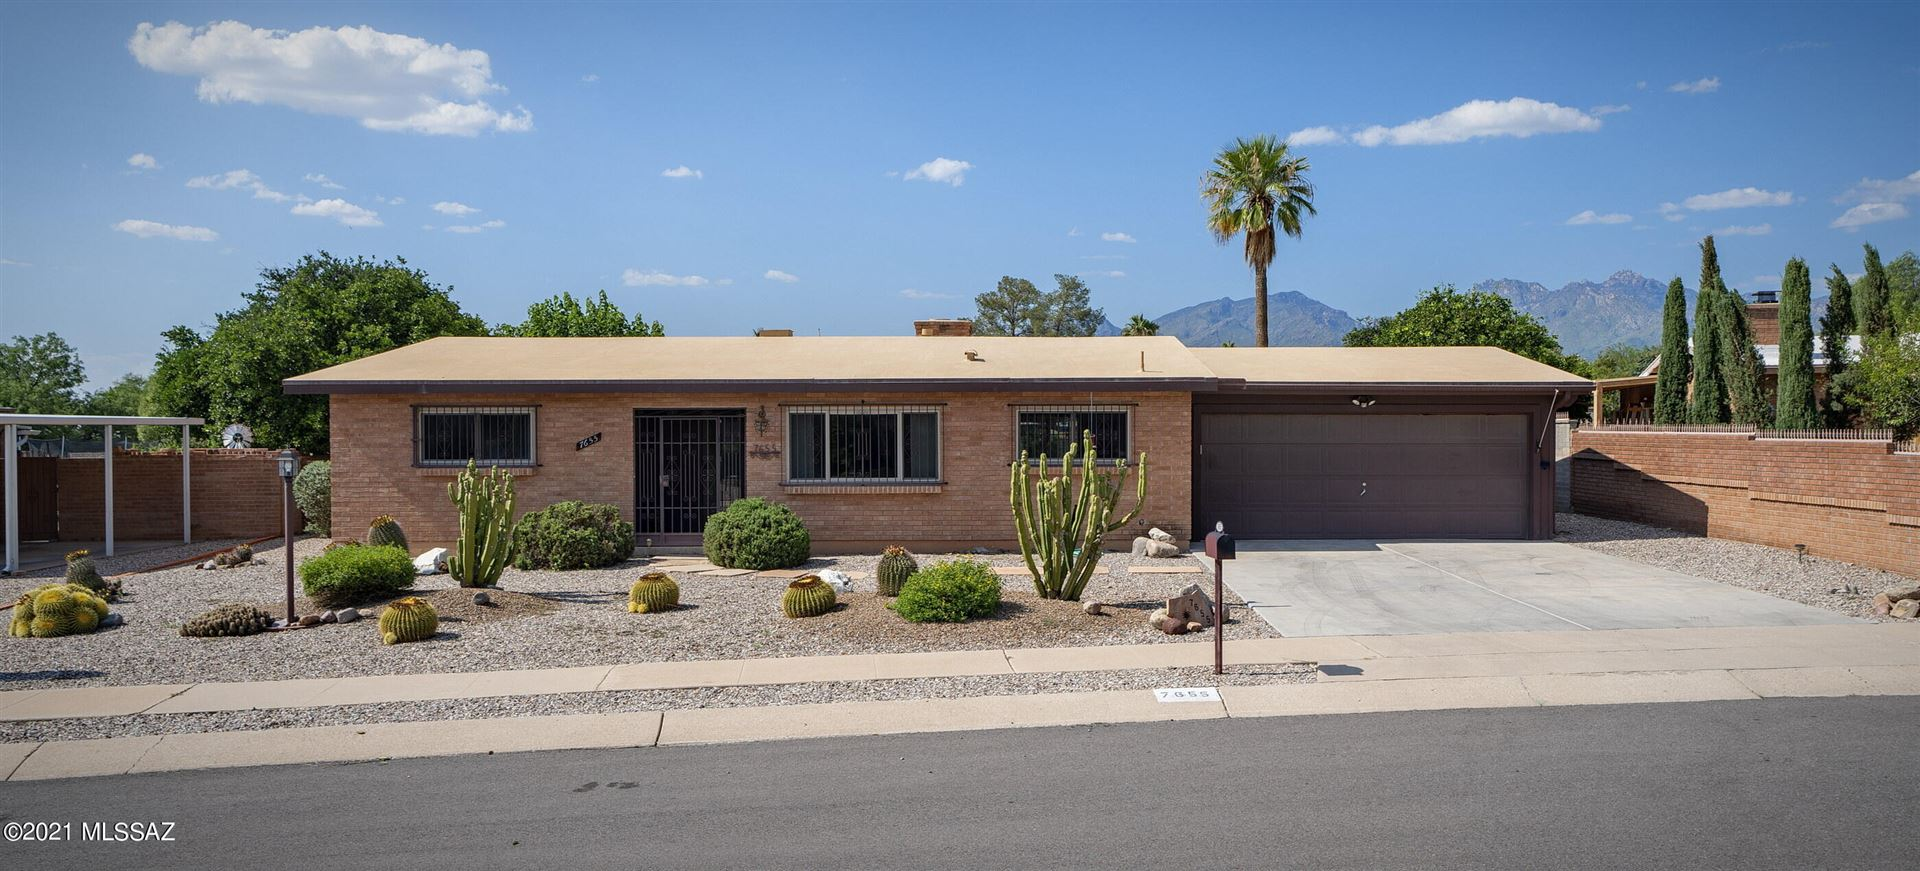 7655 E Lee Street, Tucson, AZ 85715 - MLS#: 22123901